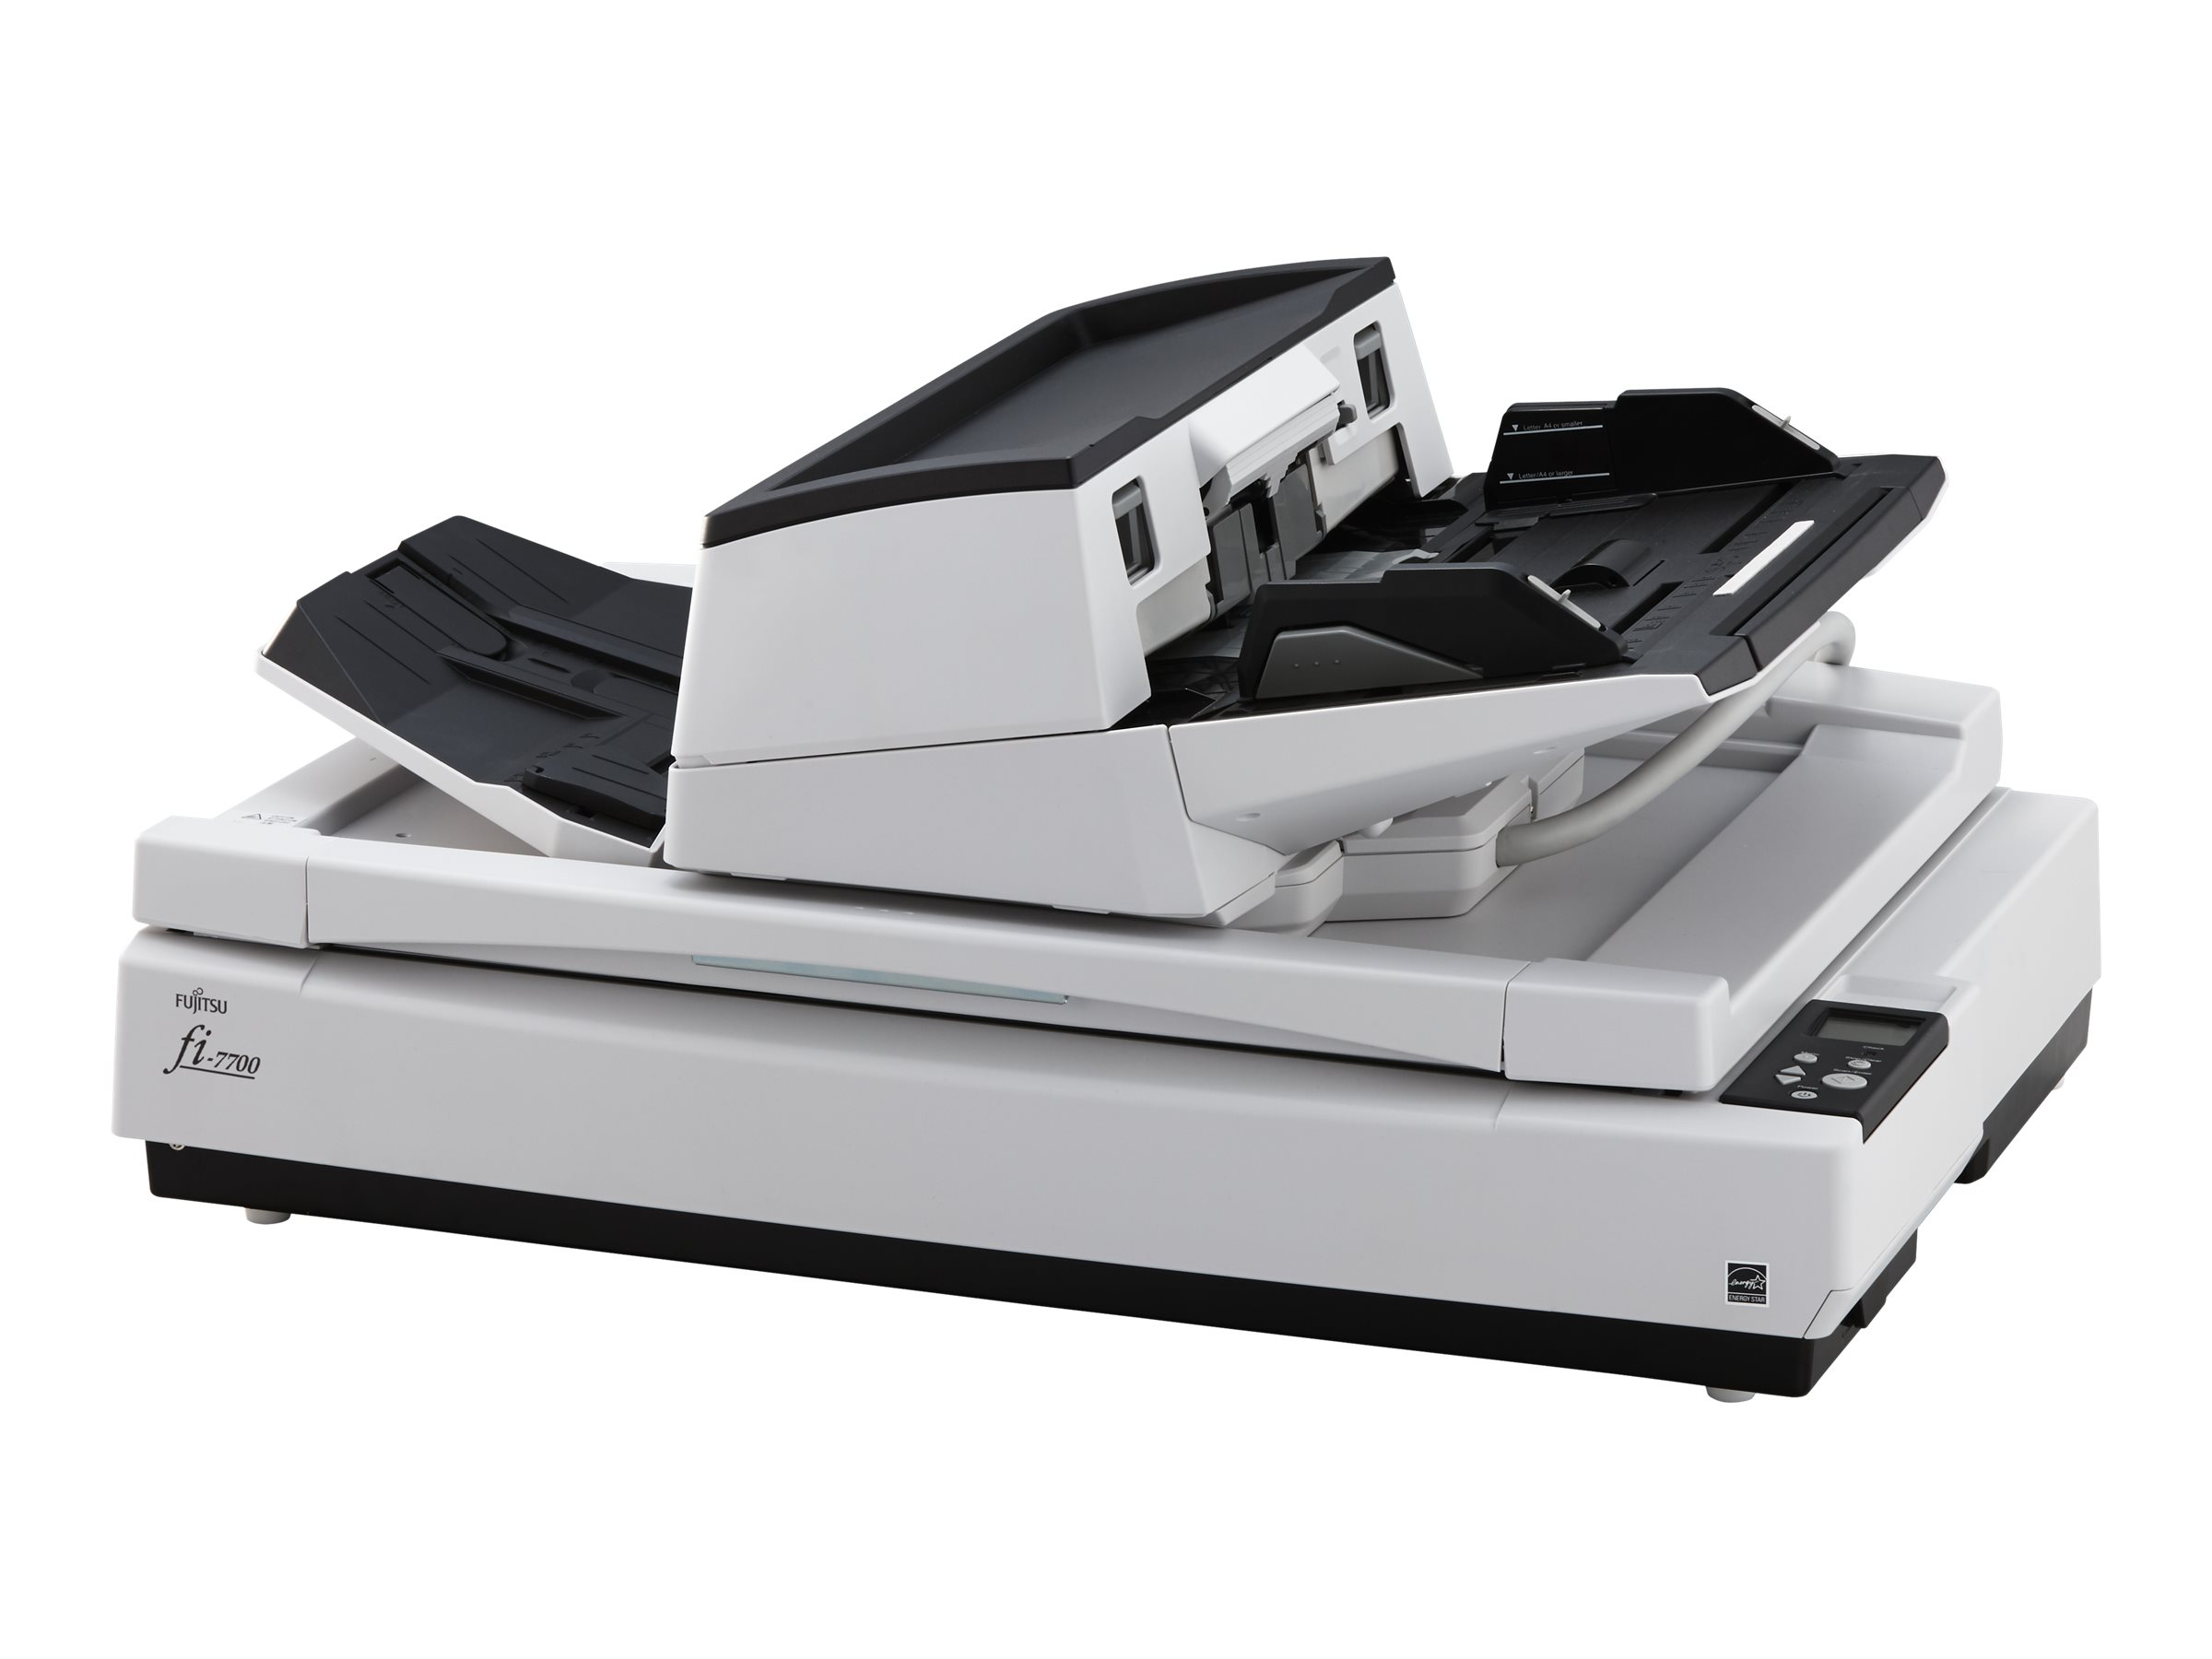 Fujitsu fi-7700 - Dokumentenscanner